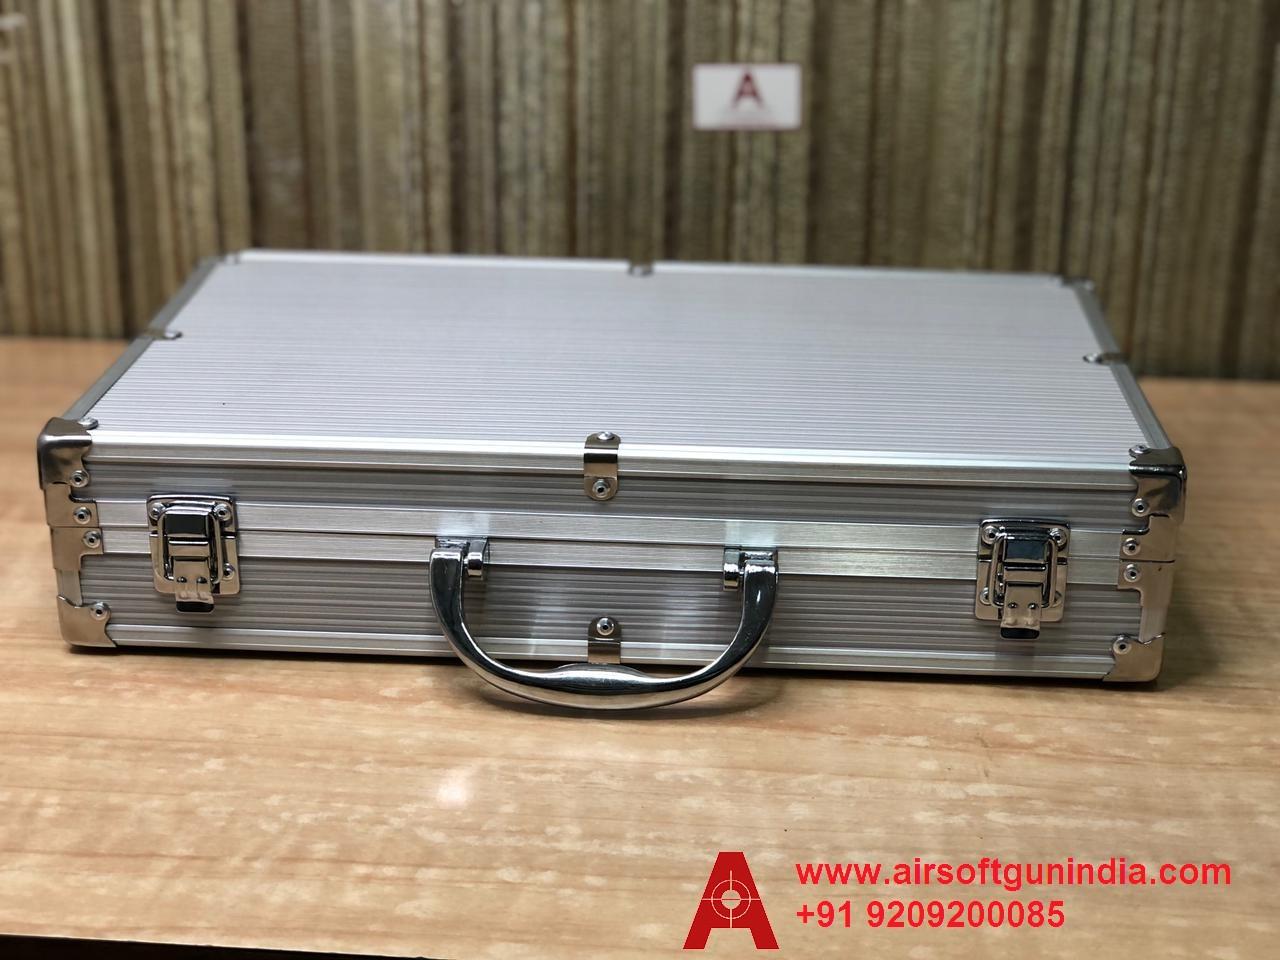 Customized Storage Metal Gun Box/ Gun Case For GAMO PR 725 Co2 Pellet Revolver By Airsoft Gun India